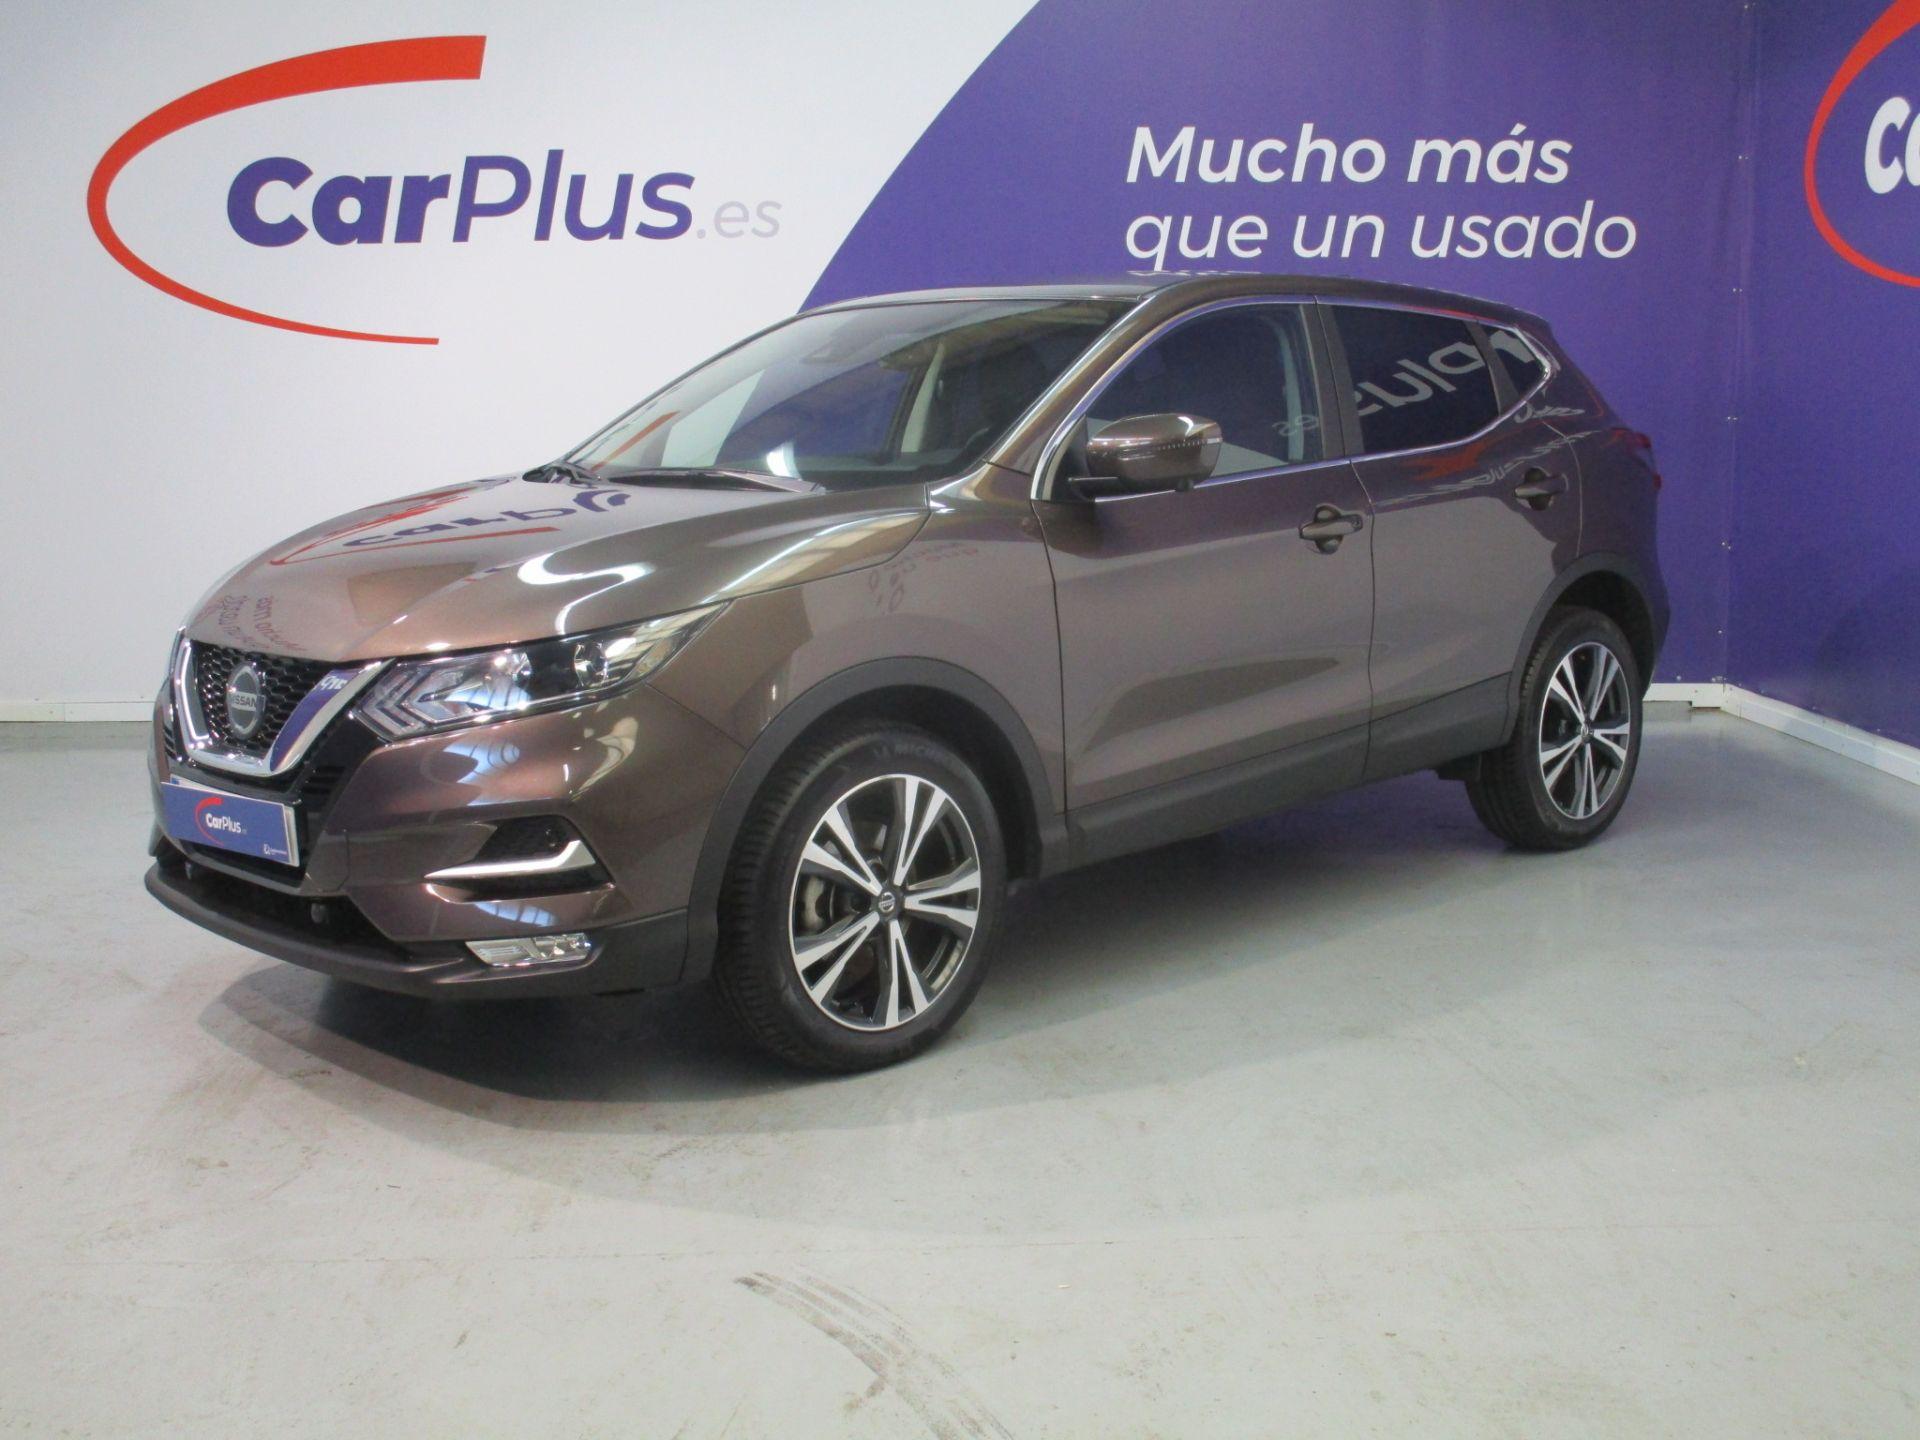 Nissan Qashqai DIG-T 117 kW (160 CV) E6D DCT N-CONNECTA segunda mano Madrid